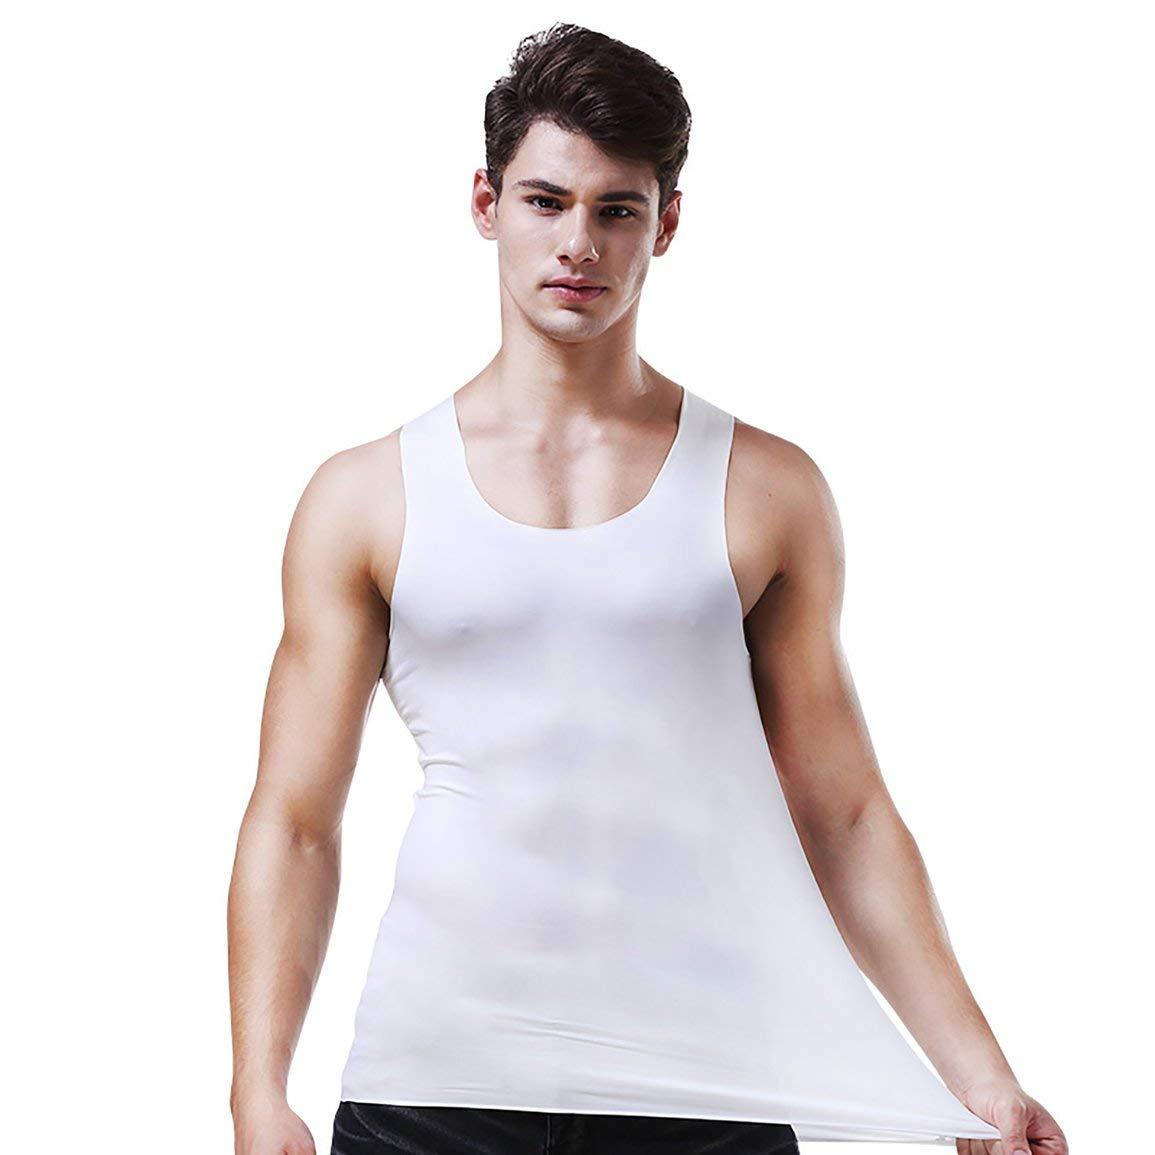 Blanco fghfhfgjdfj Hombres Moda Deporte Al Aire Libre Ejecuci/ón de Hielo Chaleco de Seda Camisa sin Costuras Faja Ropa Interior Fitness Cuerpo Adelgazante C/ómodo Transpirable